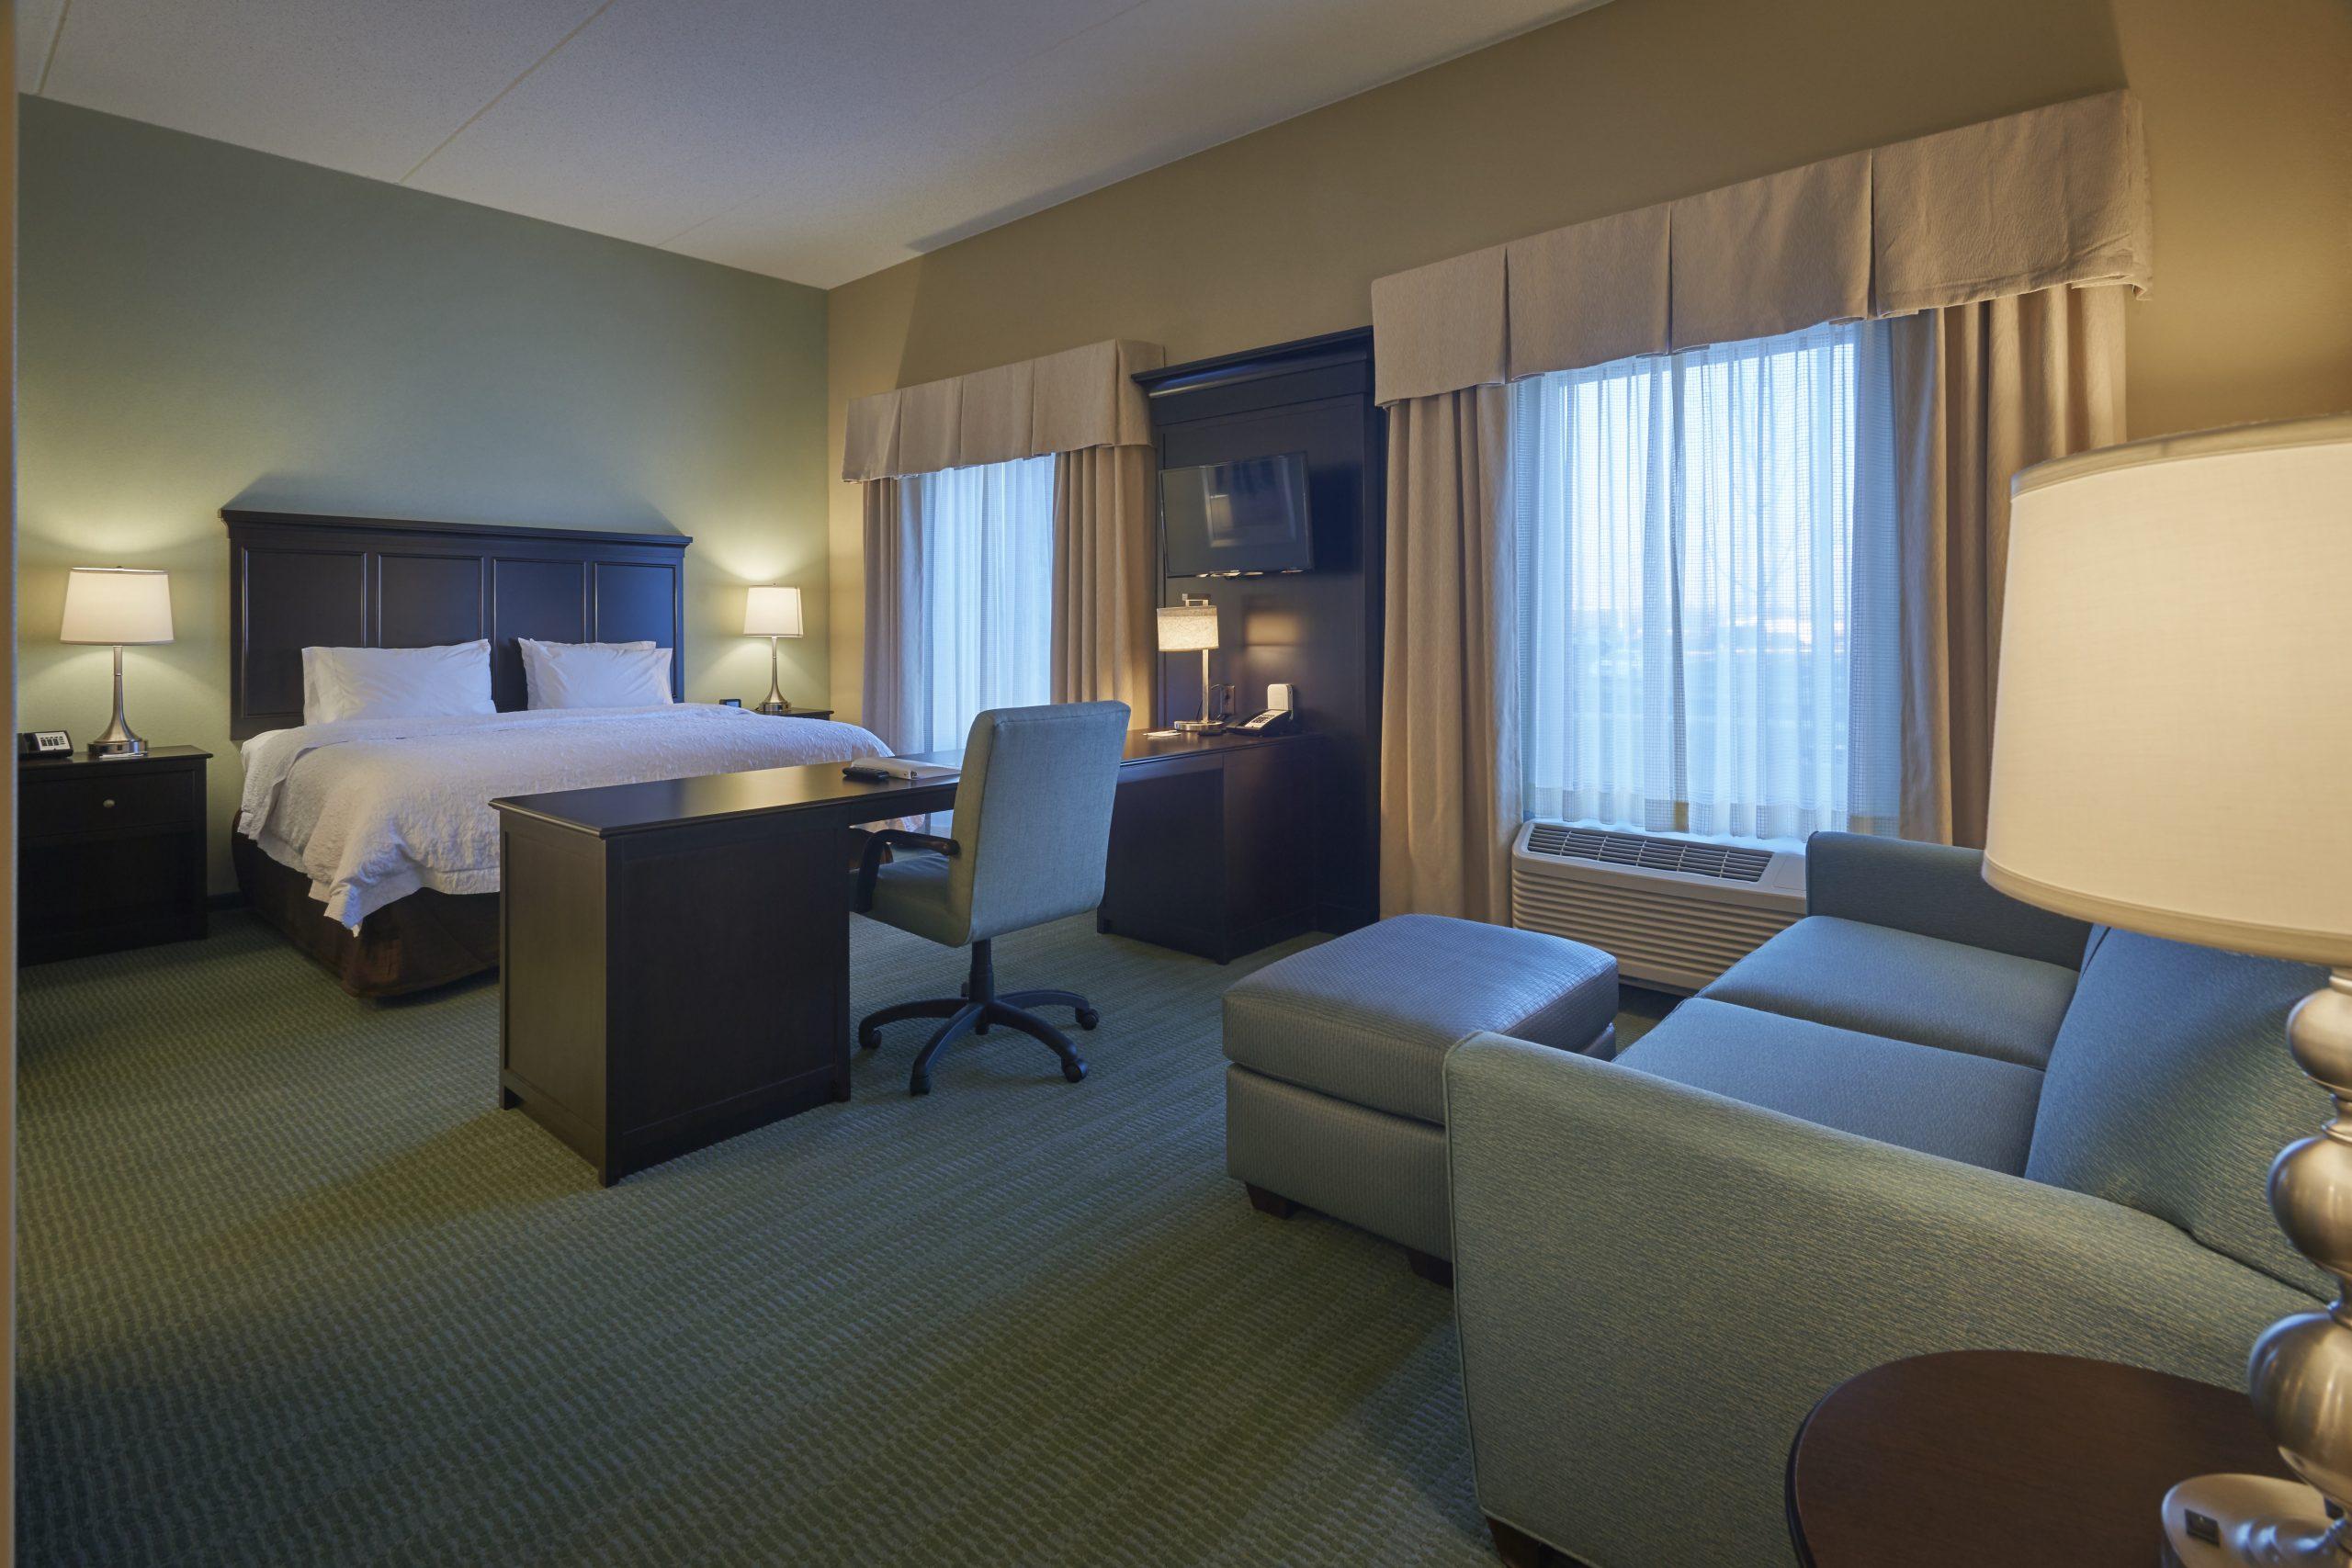 Room at the Hampton Inn